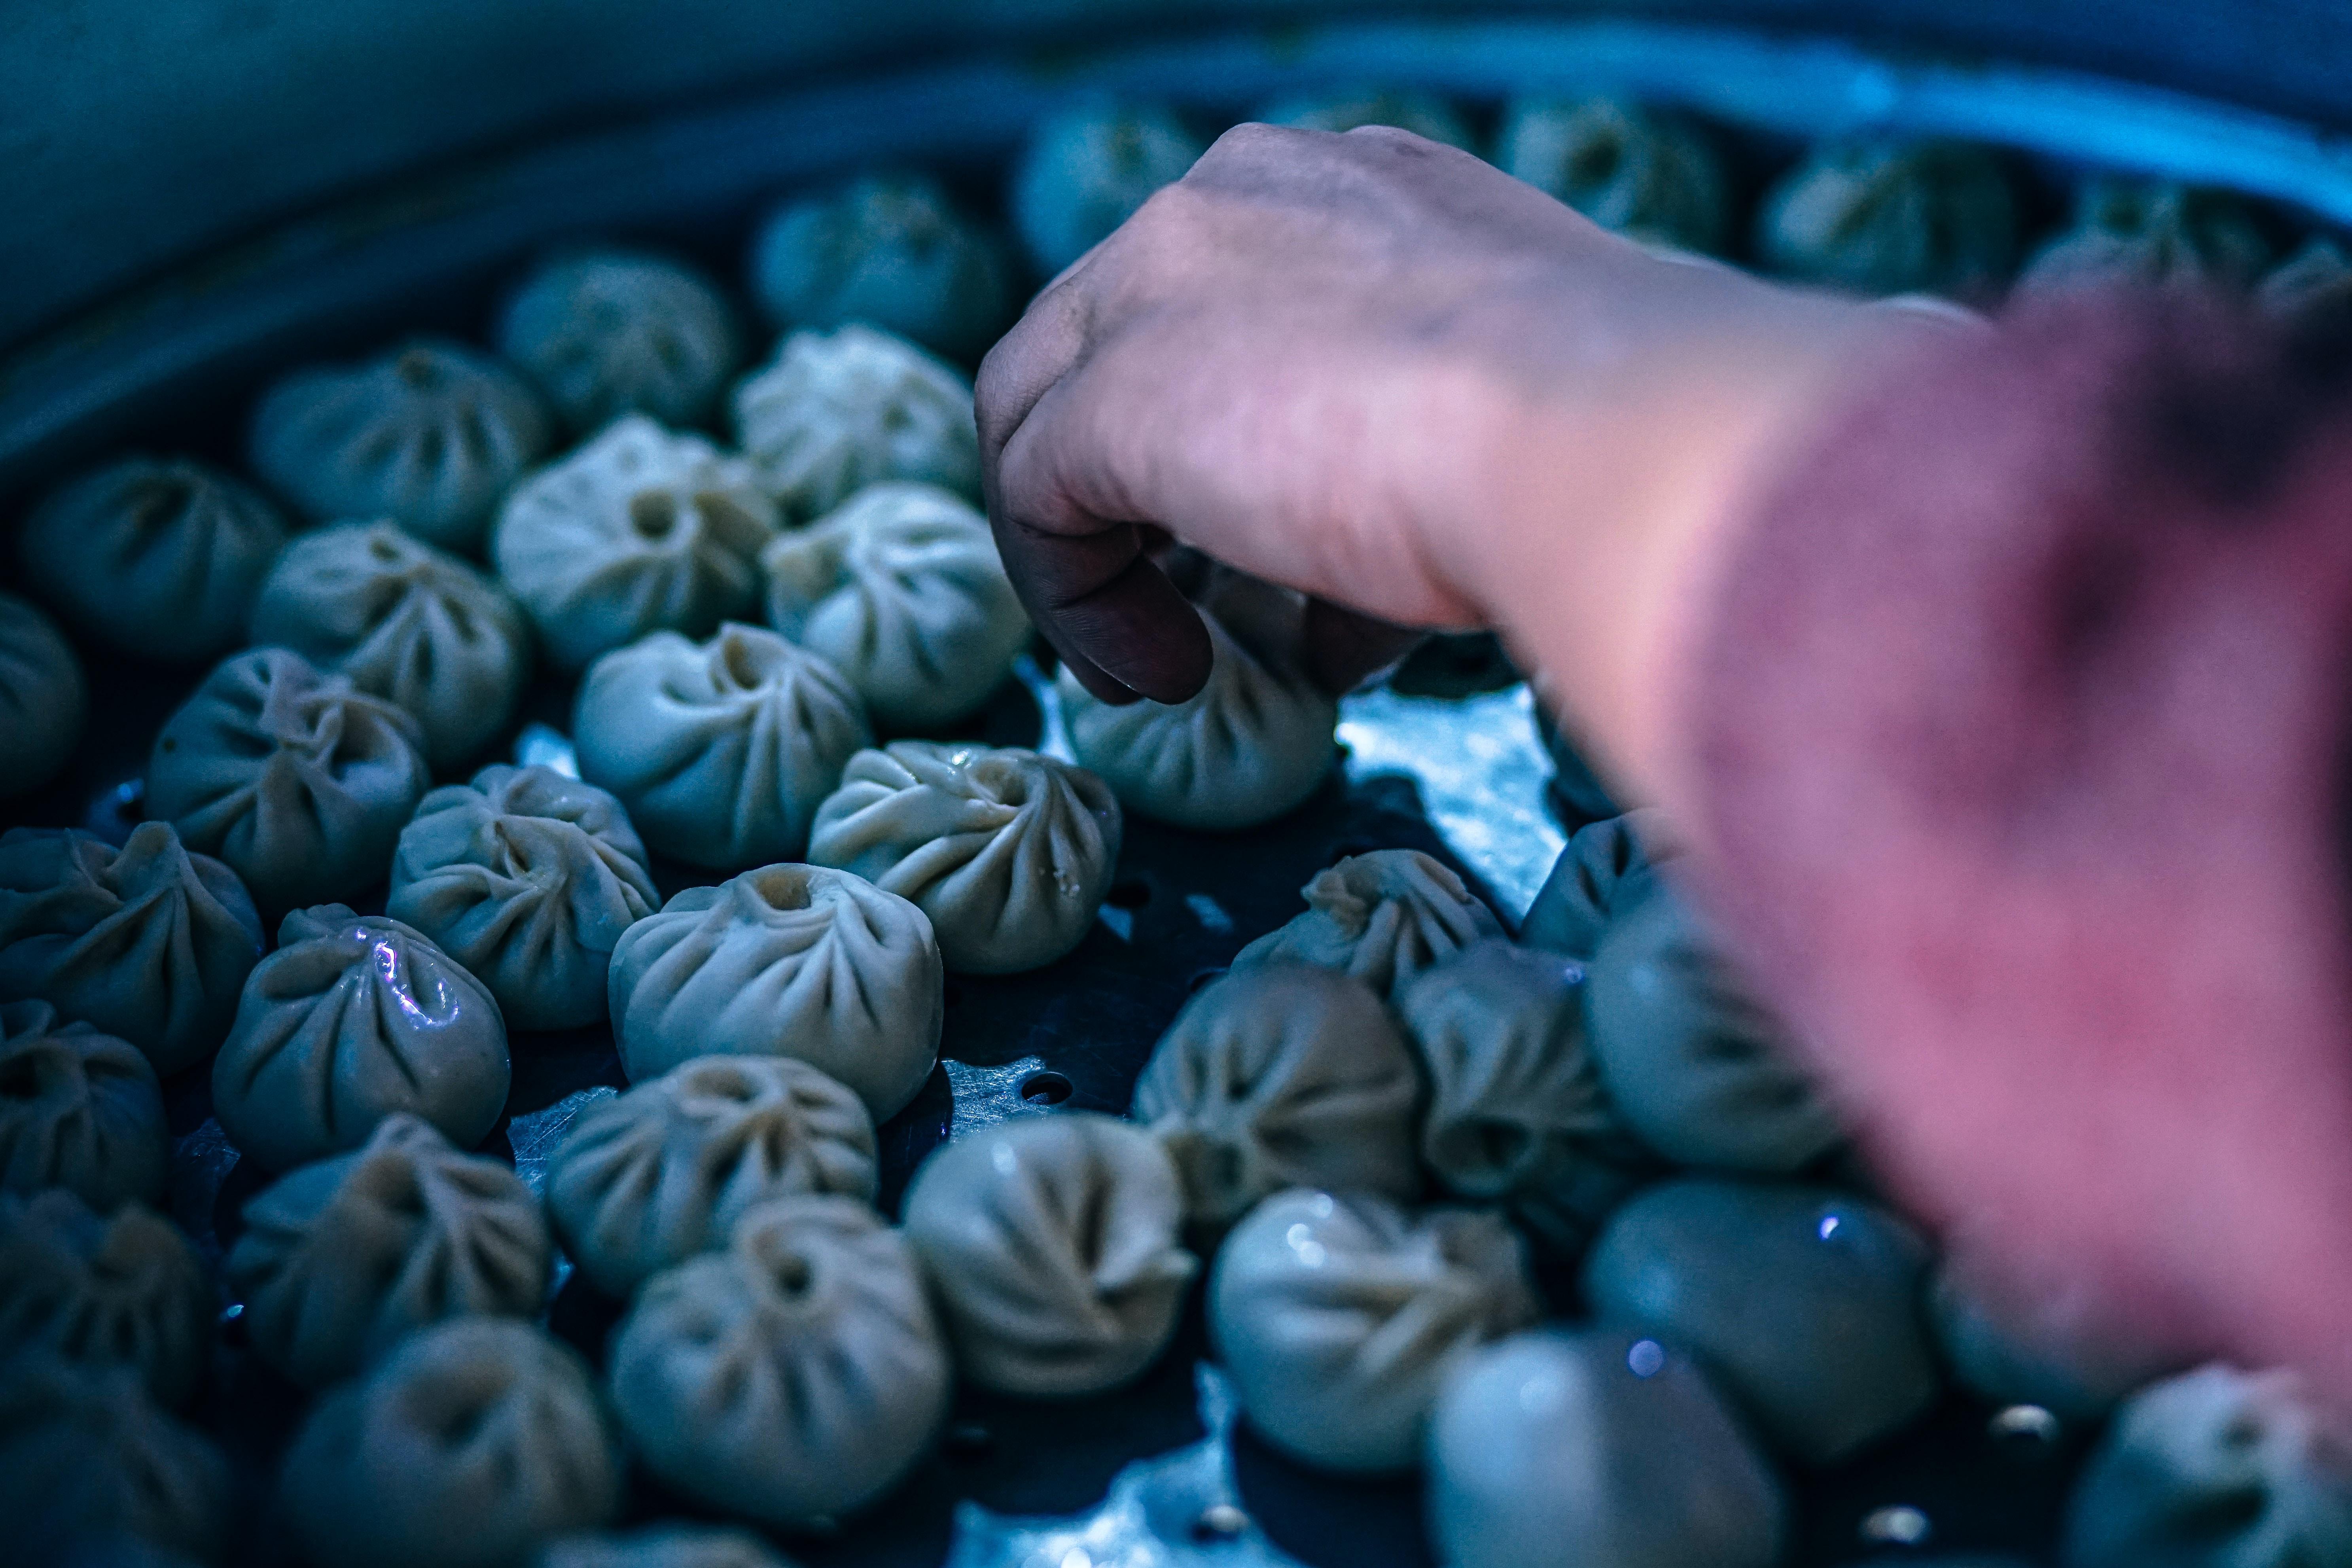 person arranging dumplings